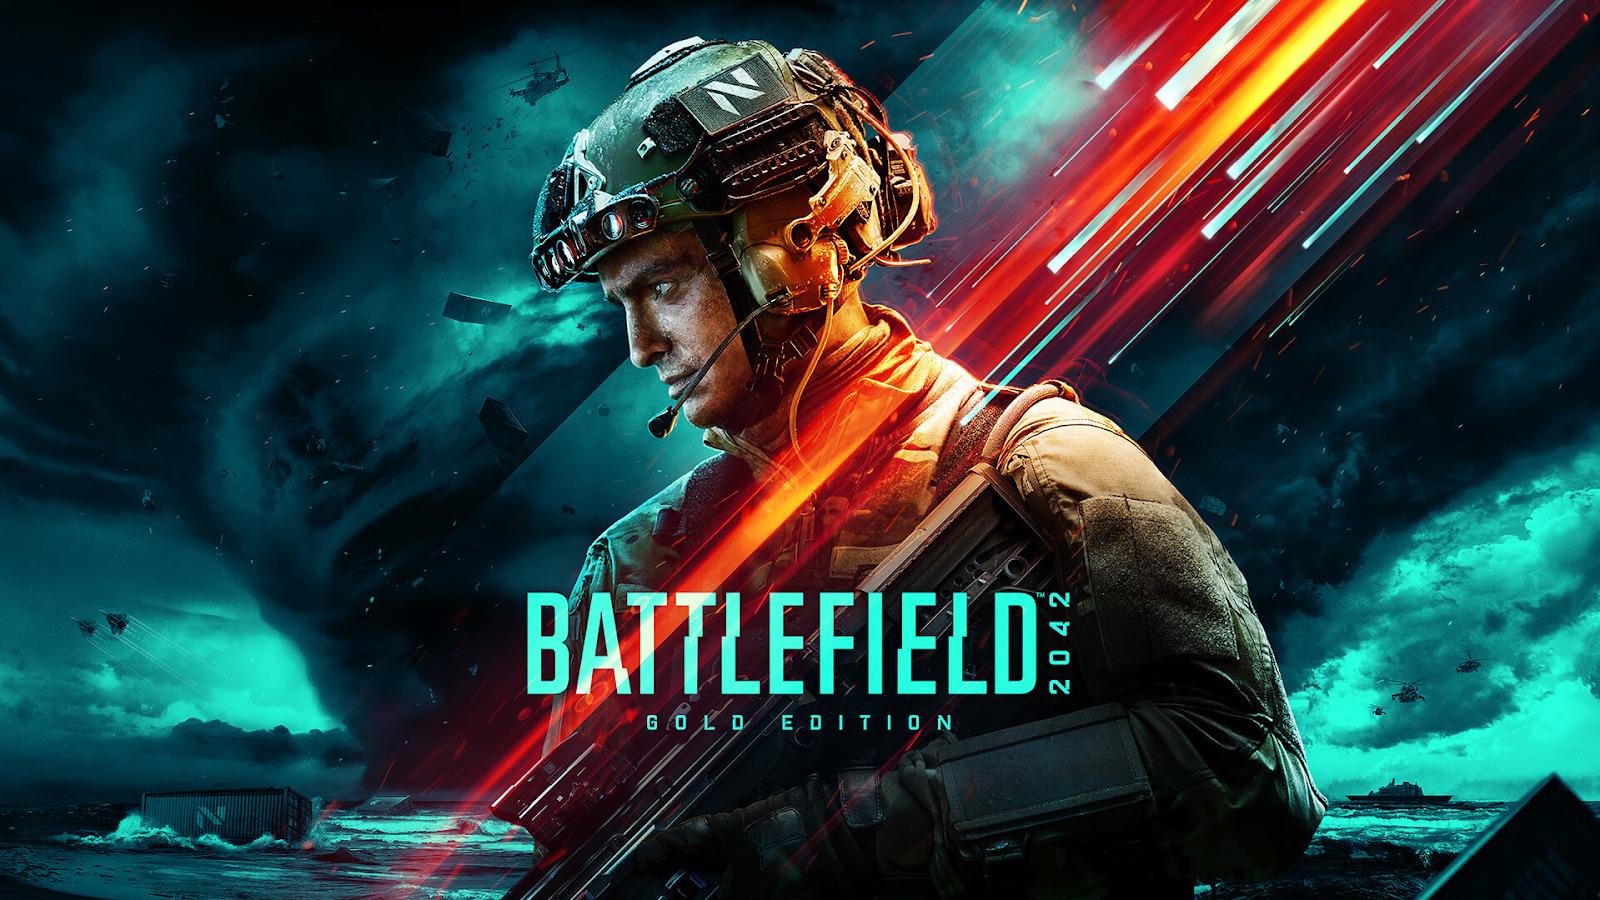 Buy Battlefield 2042 Gold Edition Digital Game Code